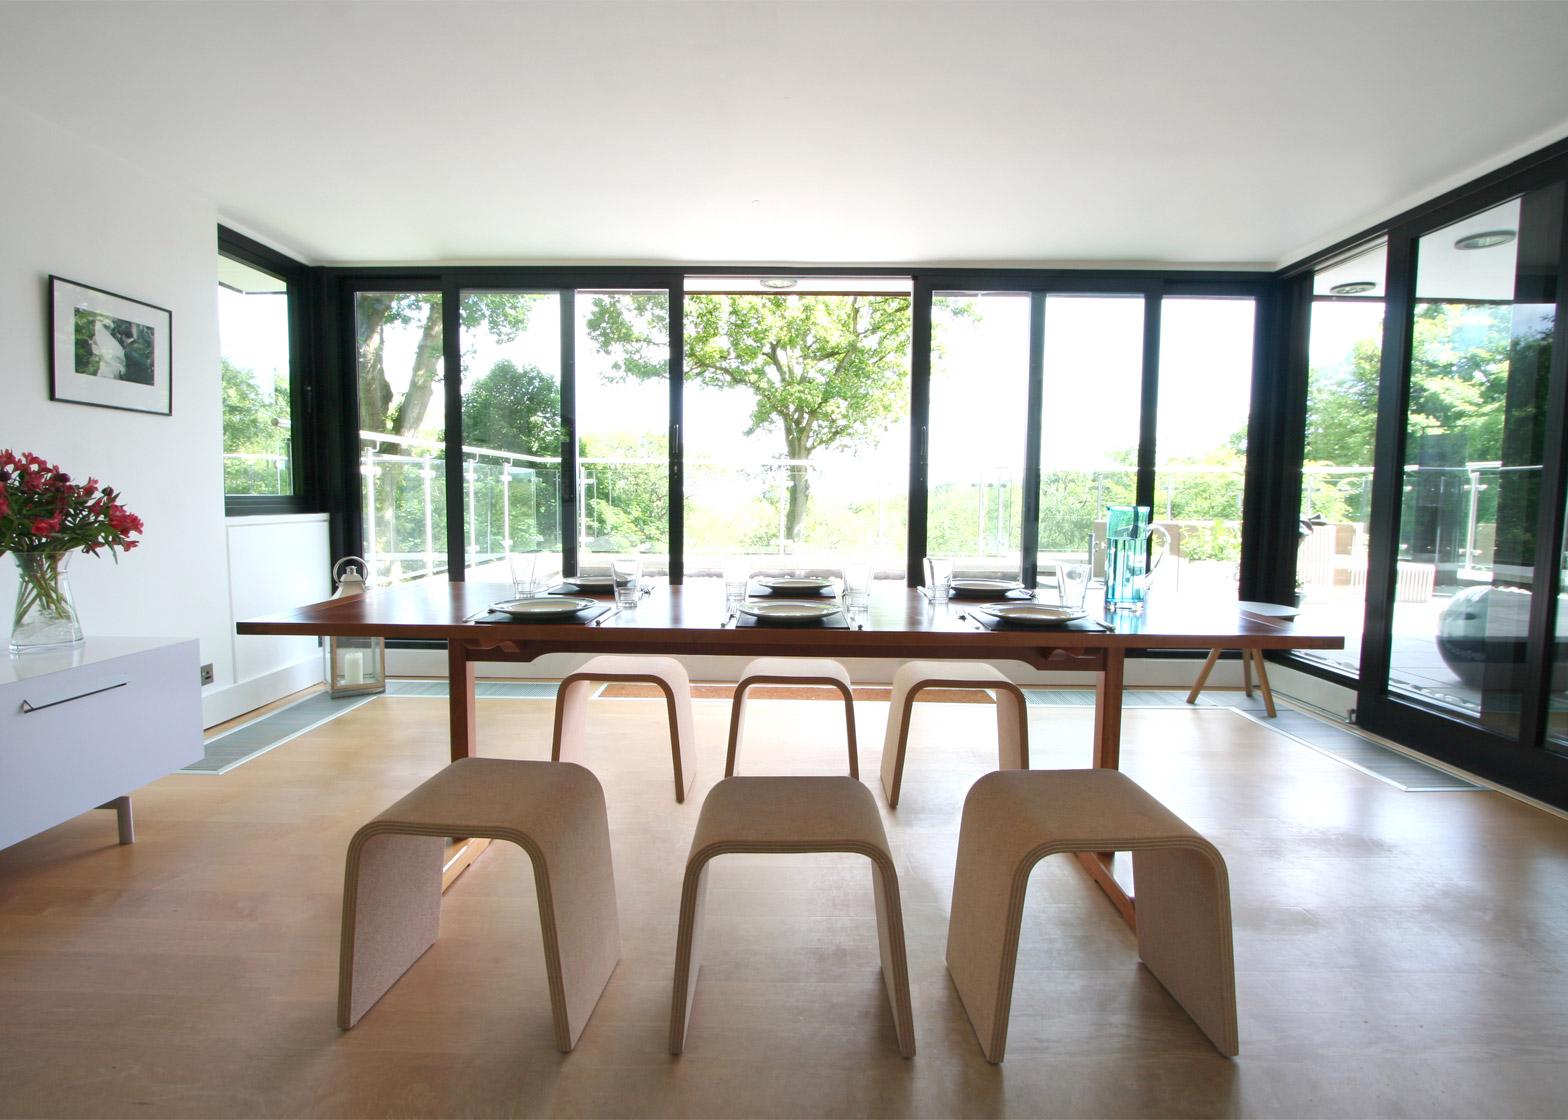 Montado stools by Charles Dedman